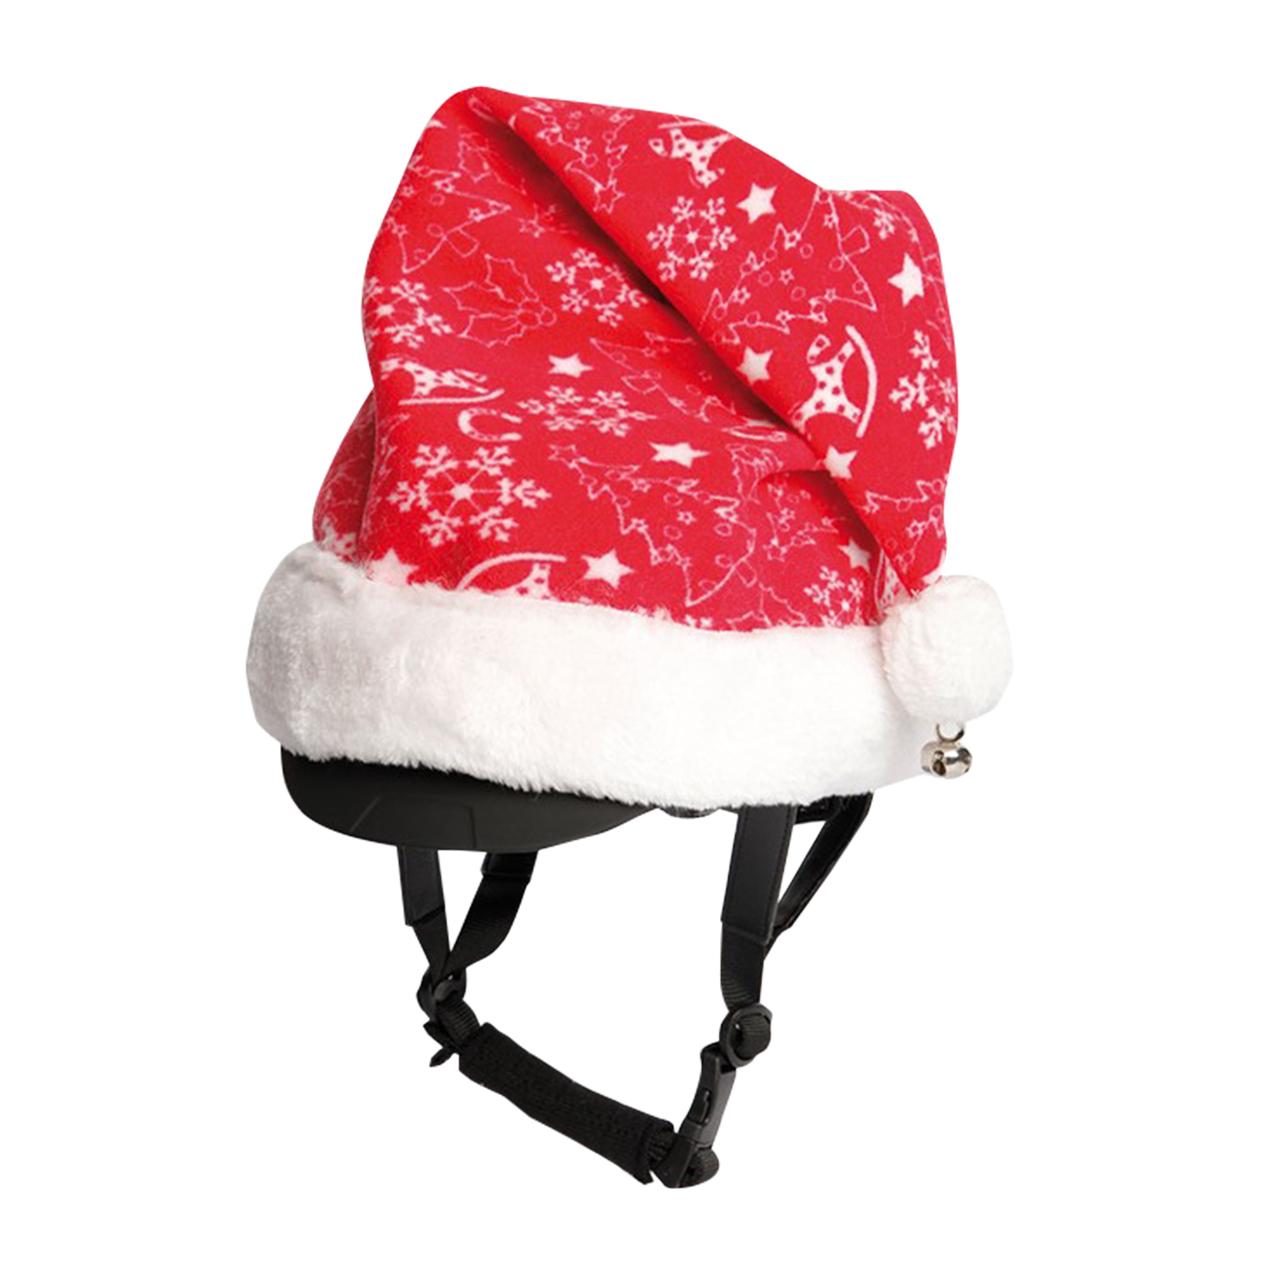 Harrys Horse Kerst cap cover Noel rood